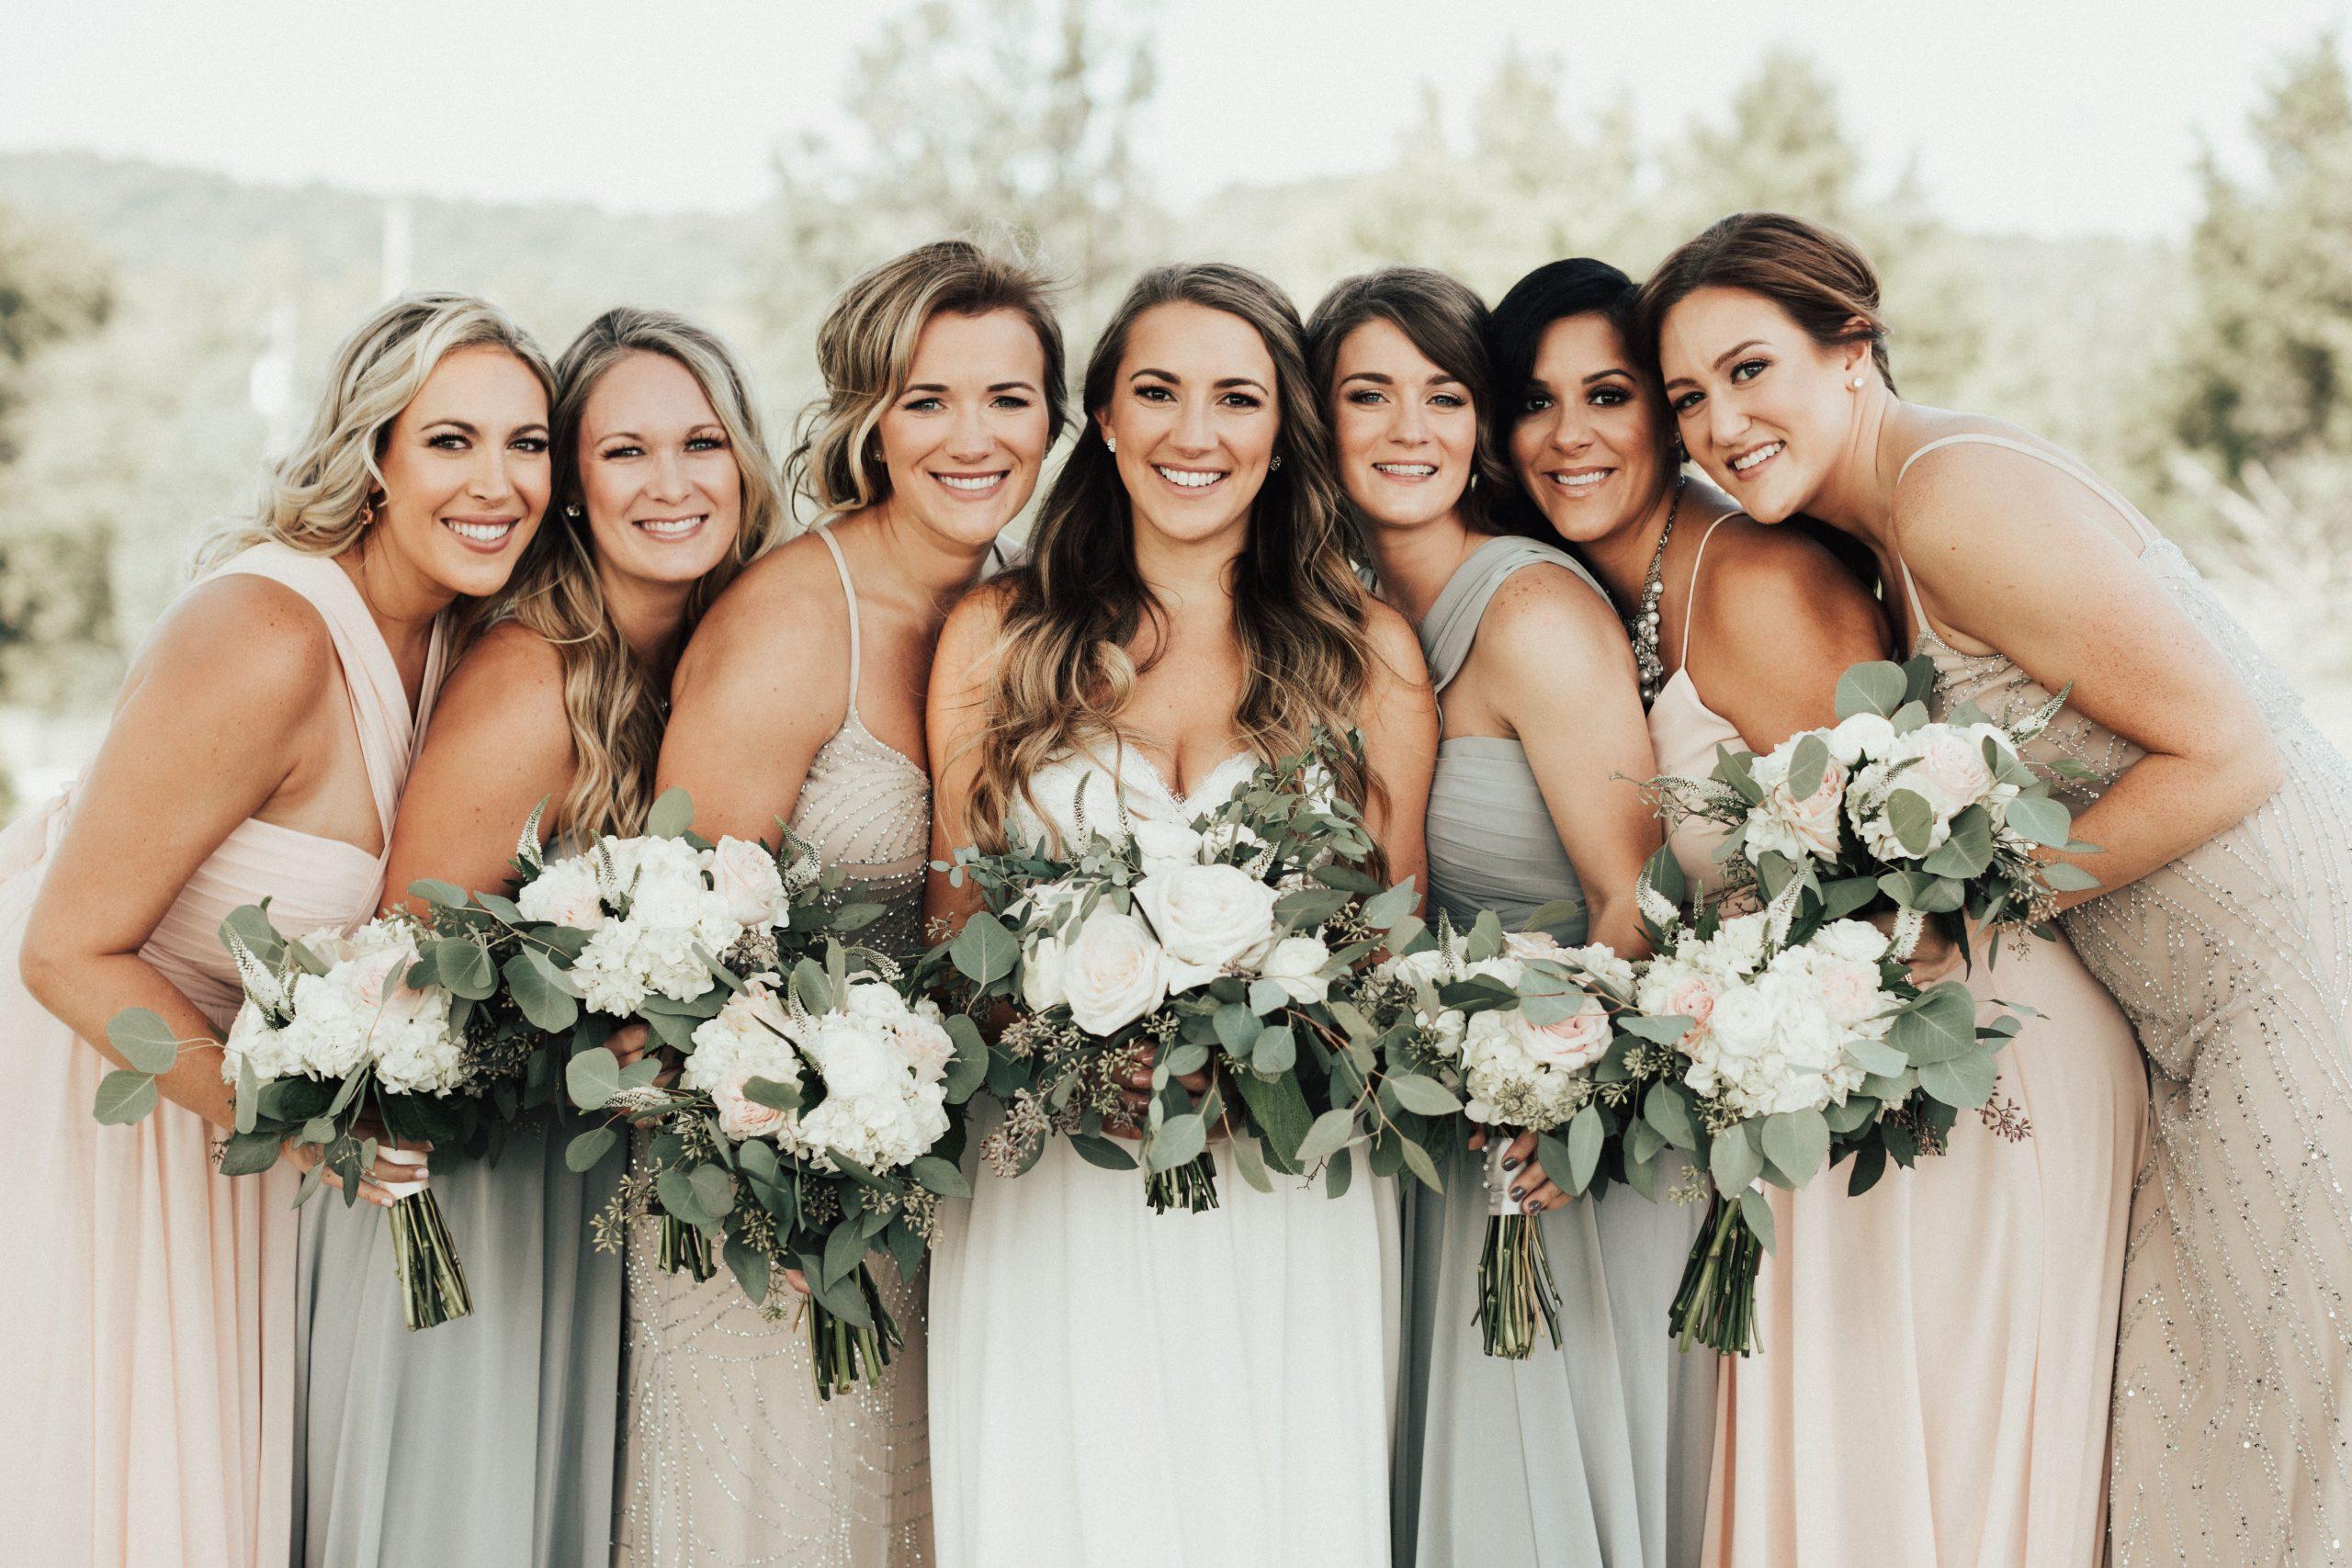 Colorado-wedding-Photographer-denver-katherine-joy-photography-3974